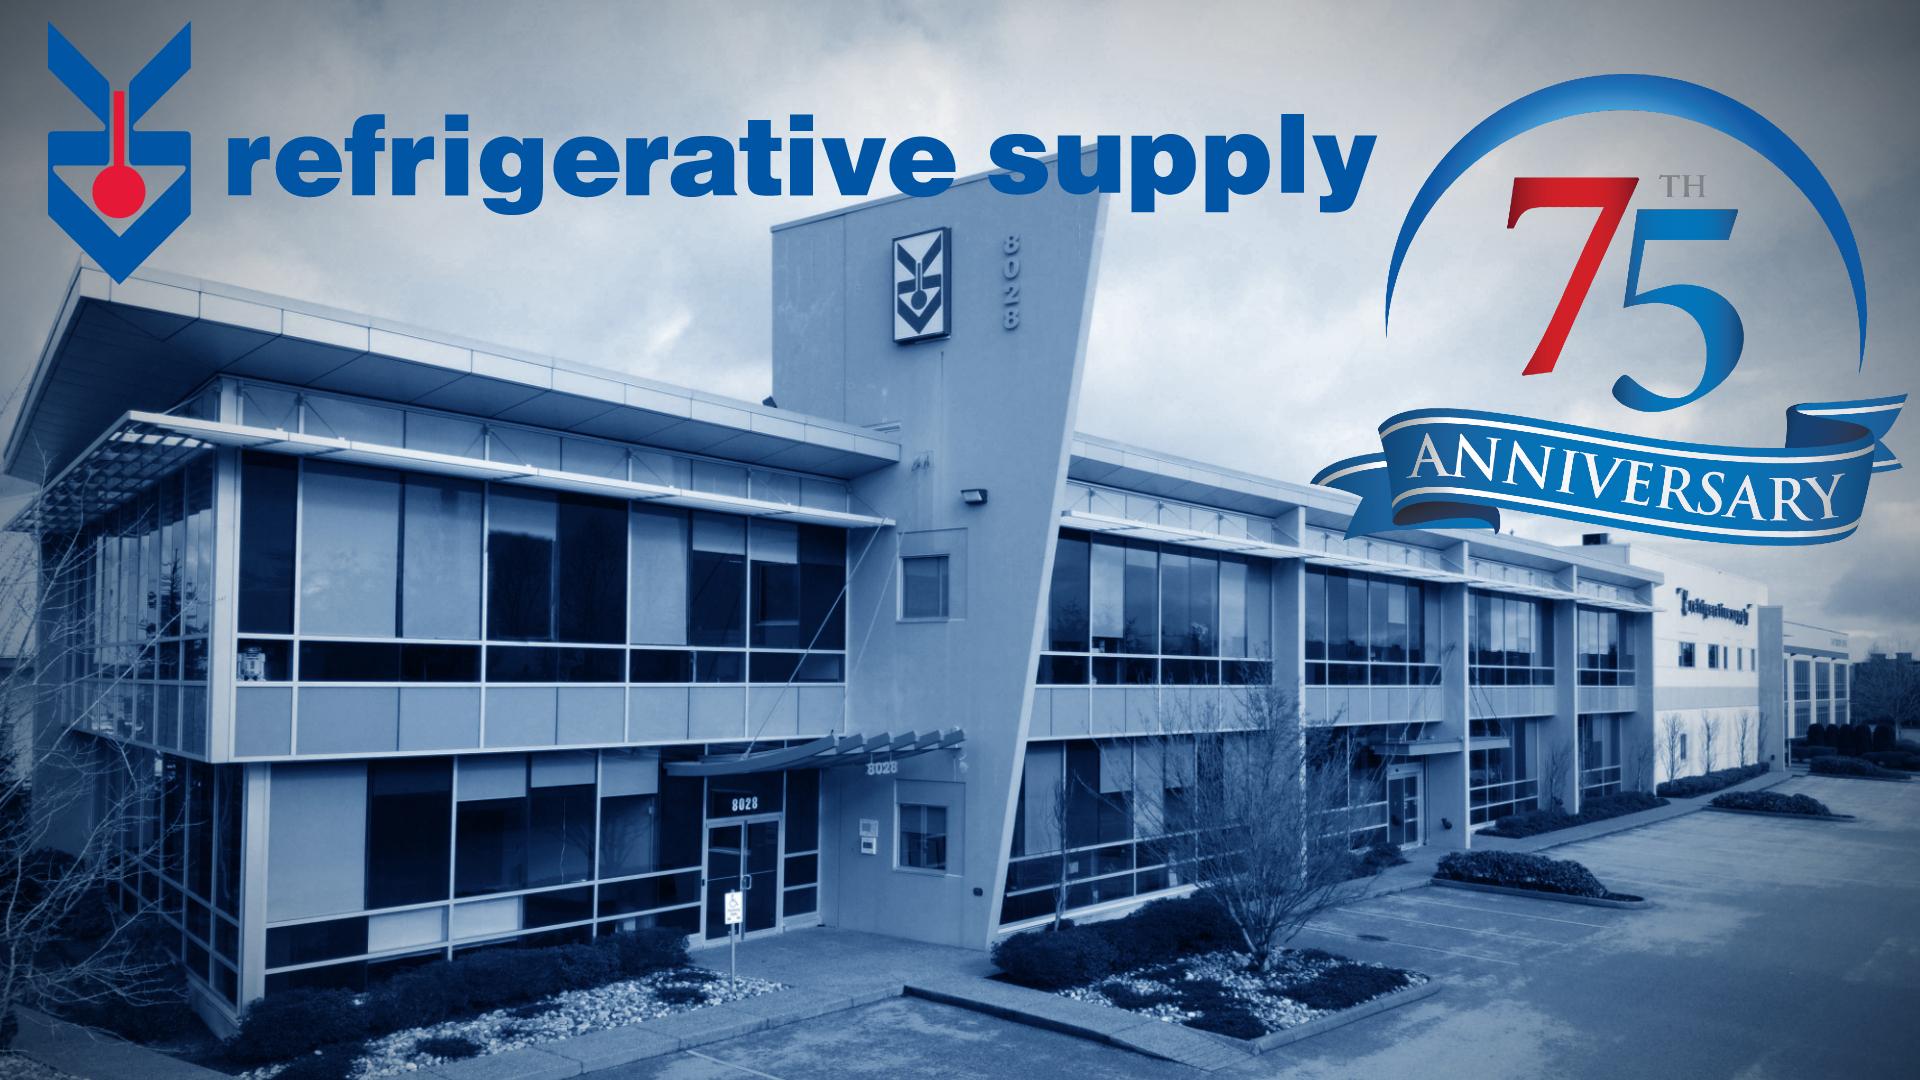 Refrigerative Supply logo